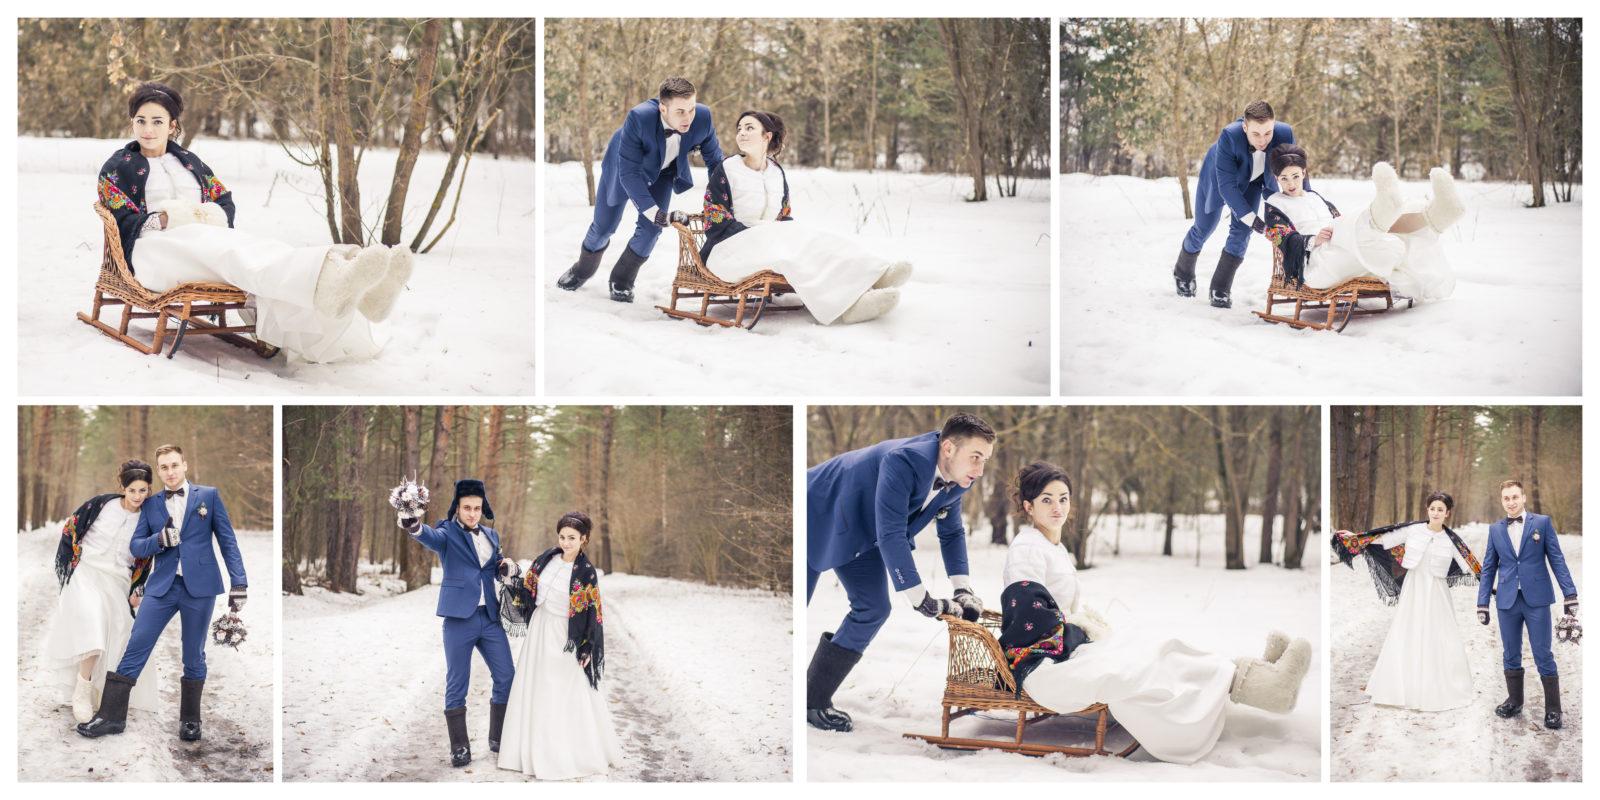 Зимняя свадьба фотокнига